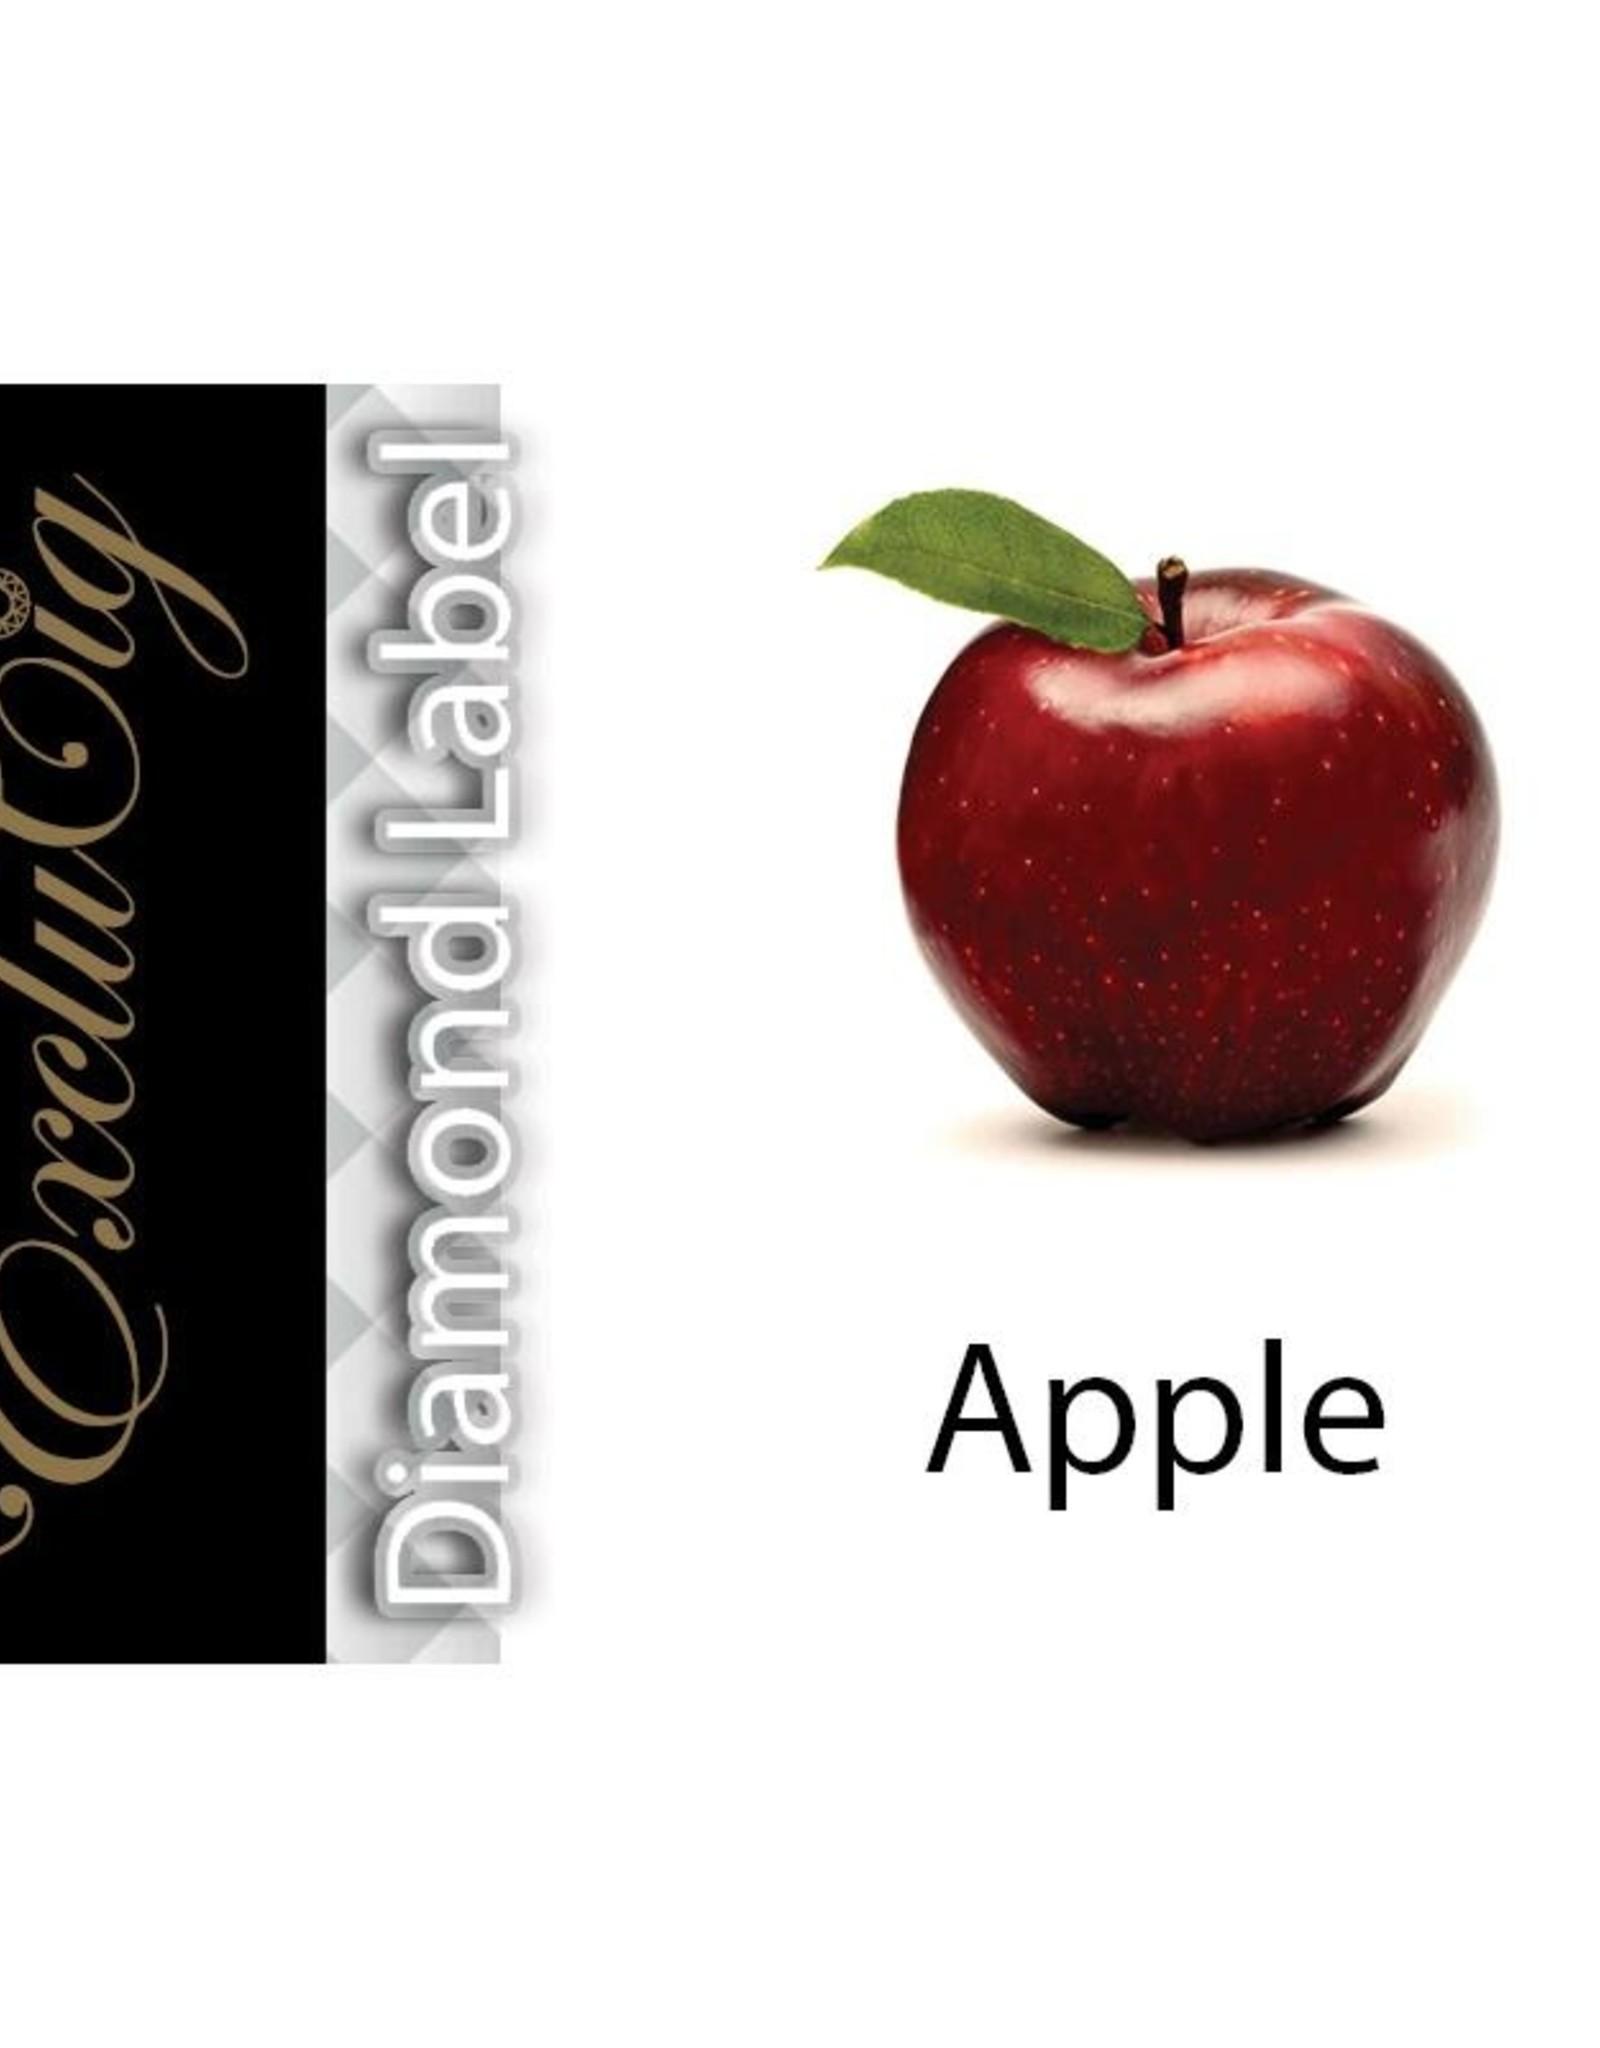 Exclucig Exclucig Diamond Label E-liquid Apple 12 mg Nicotine